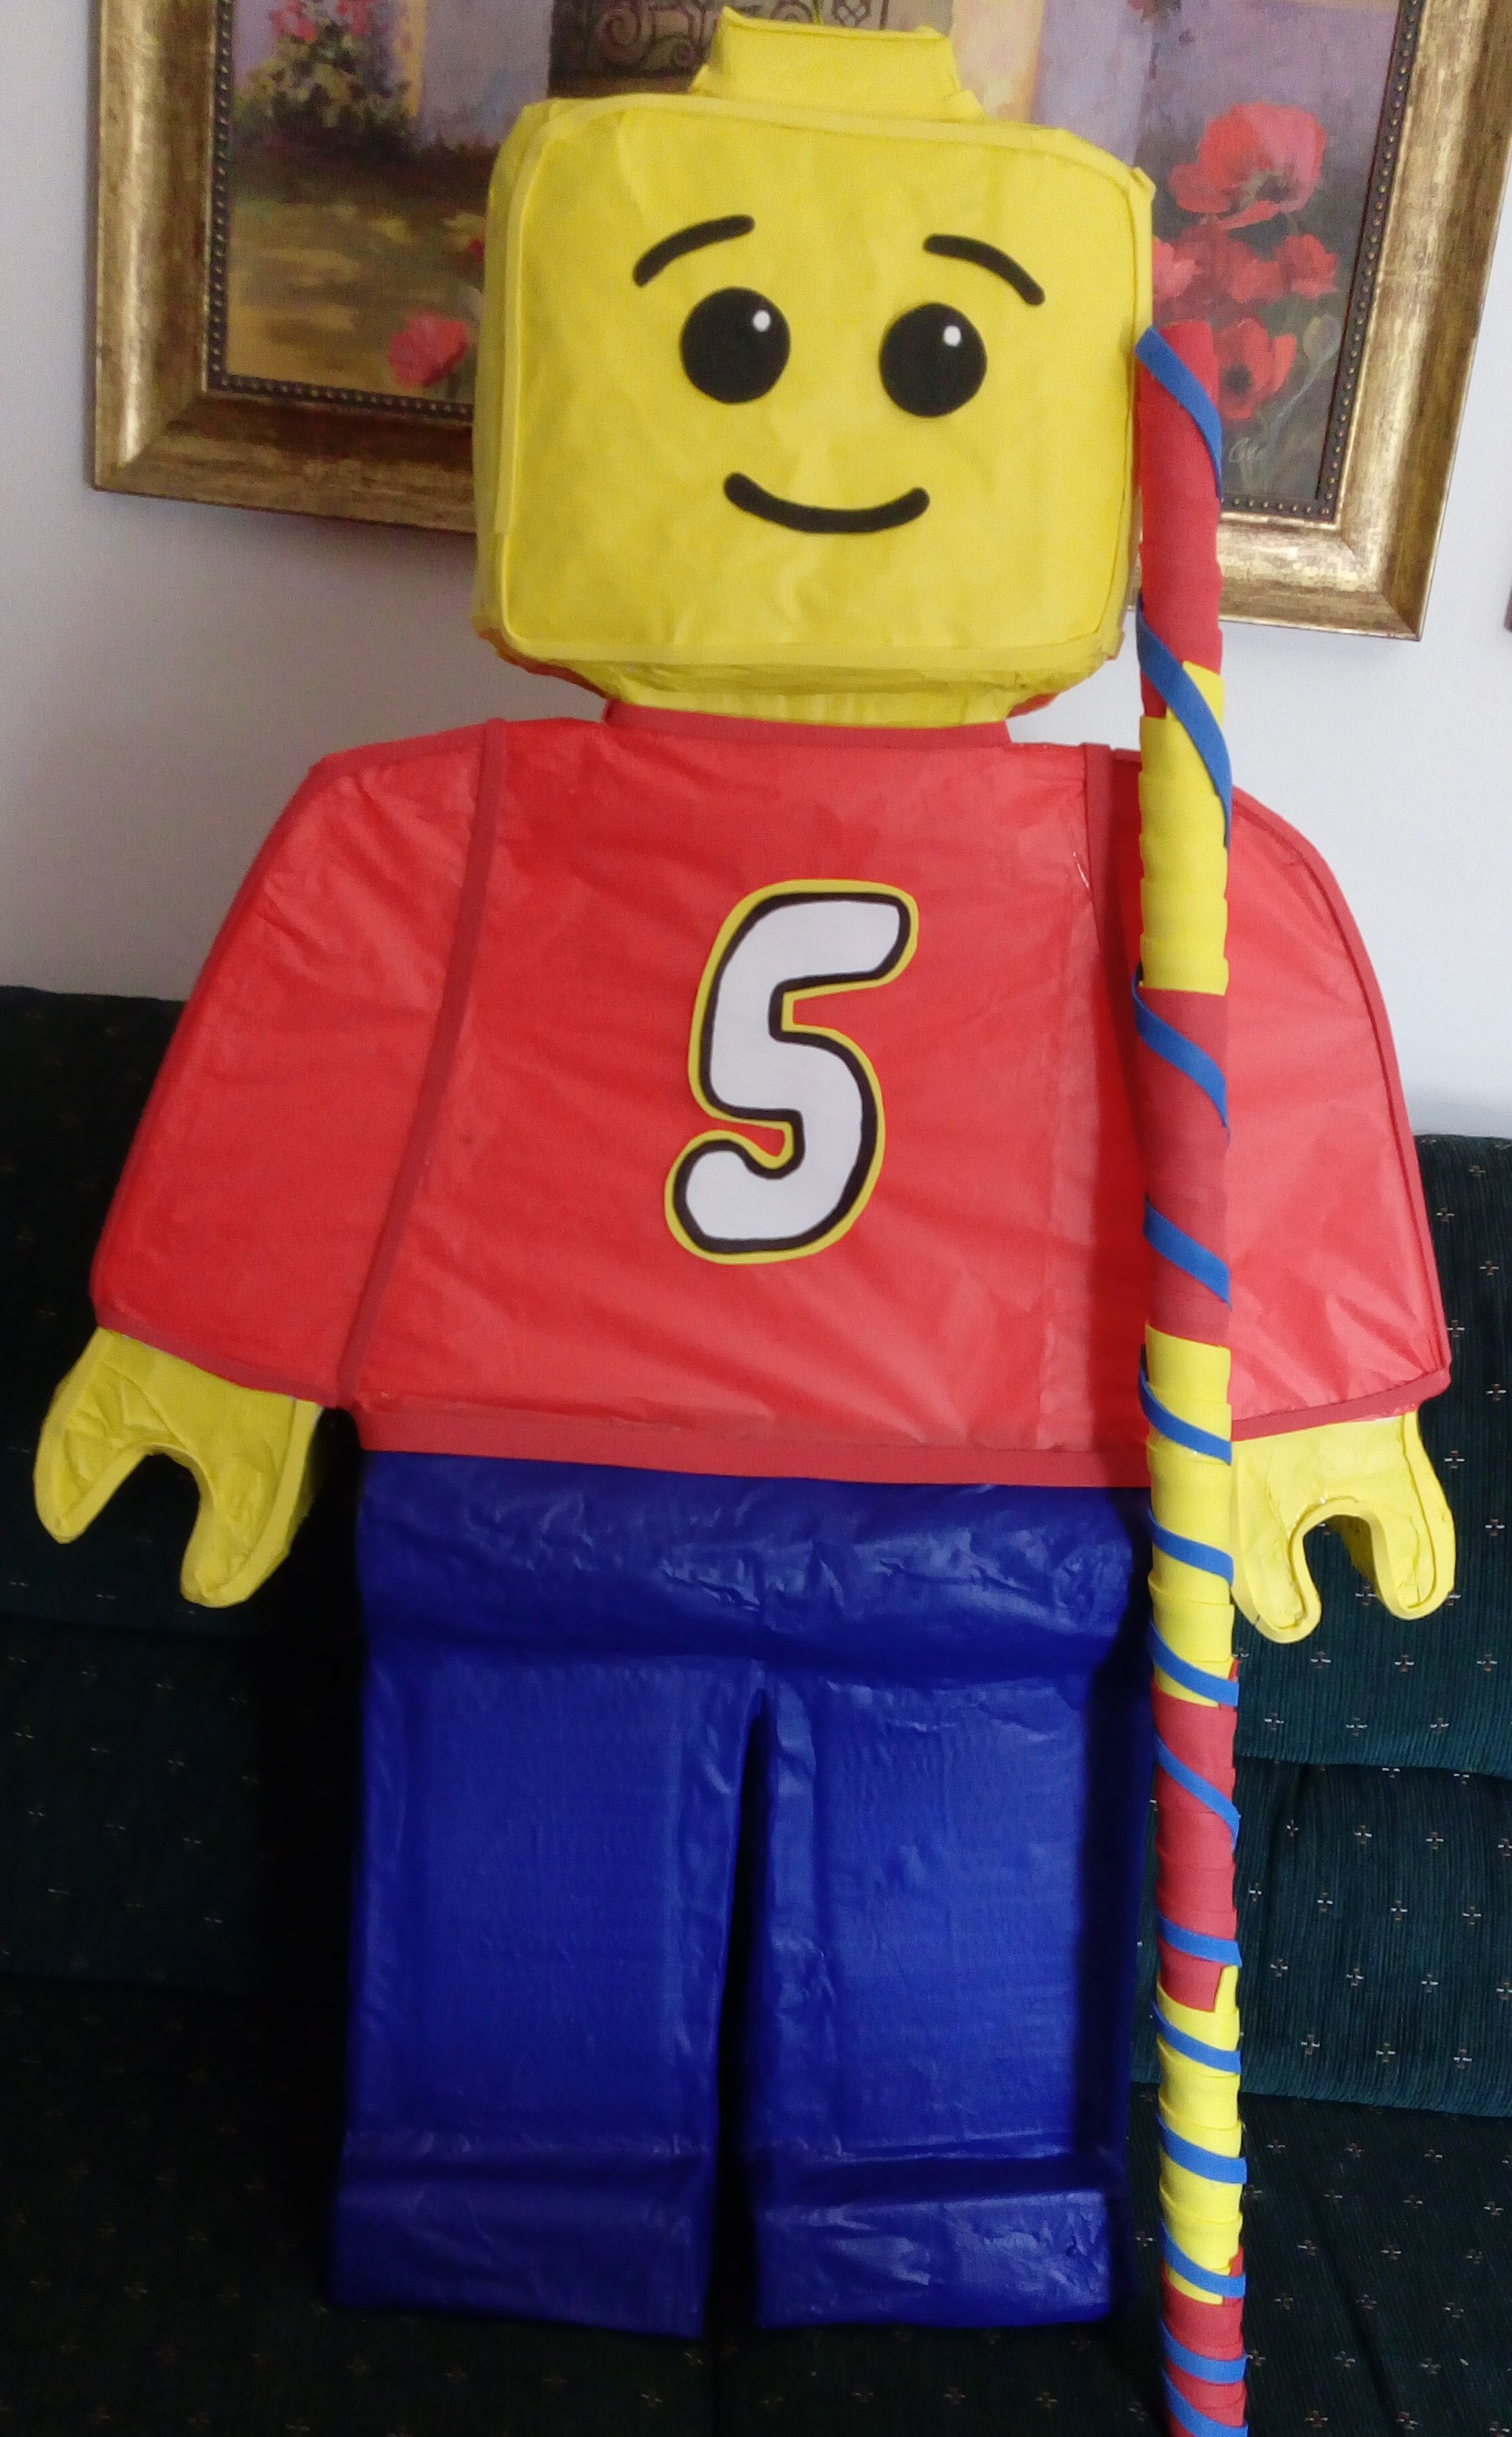 Pi 241 Ata Lego Pi 241 Atas Paula Pinterest Lego And Birthdays